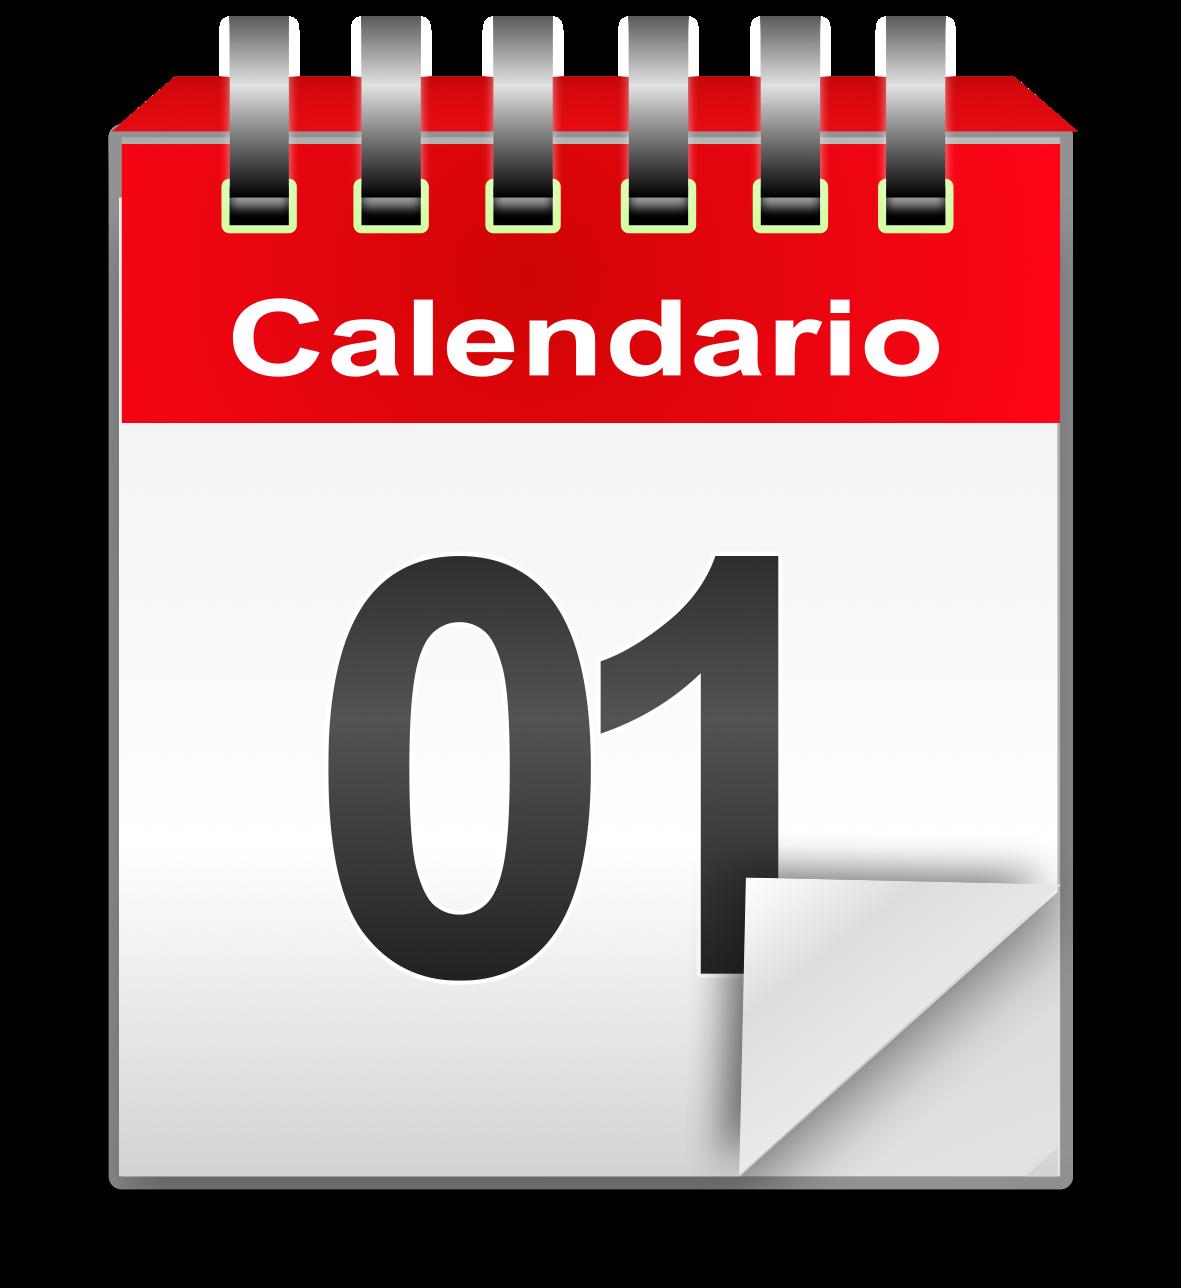 Calendar Code | Search Results | Calendar 2015